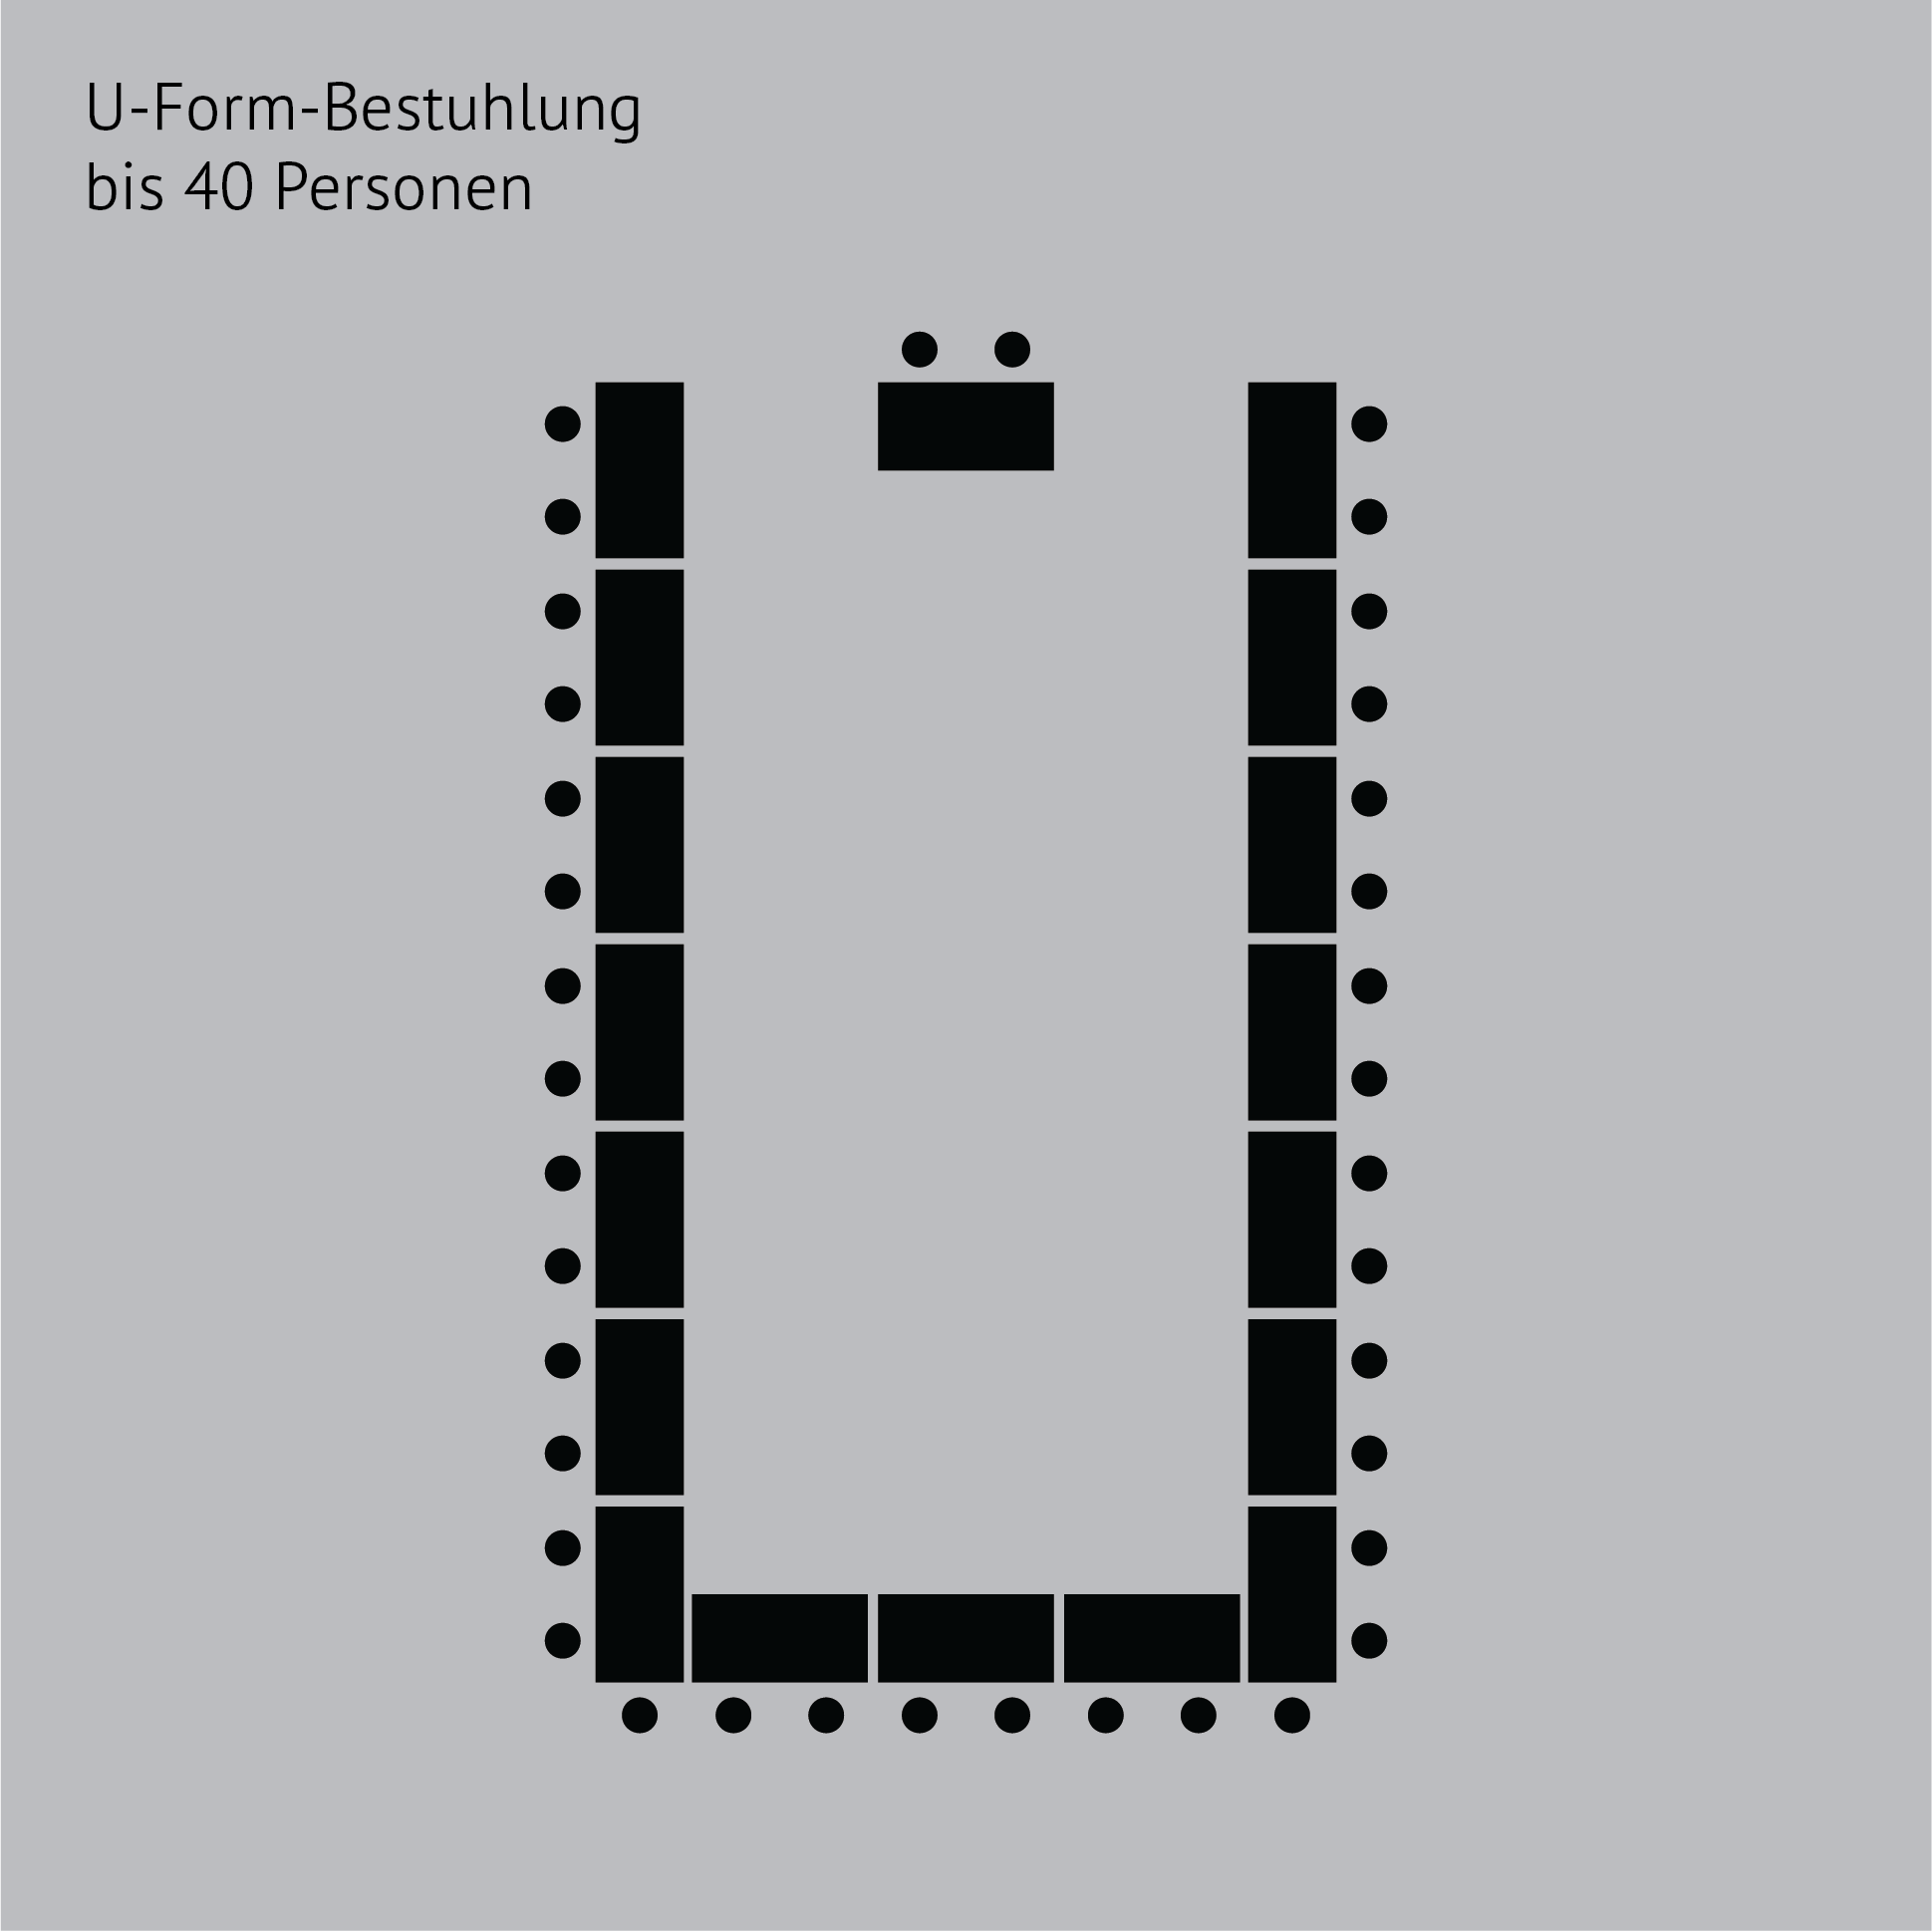 Seminarraum_Saentis_465x465px_U-Form